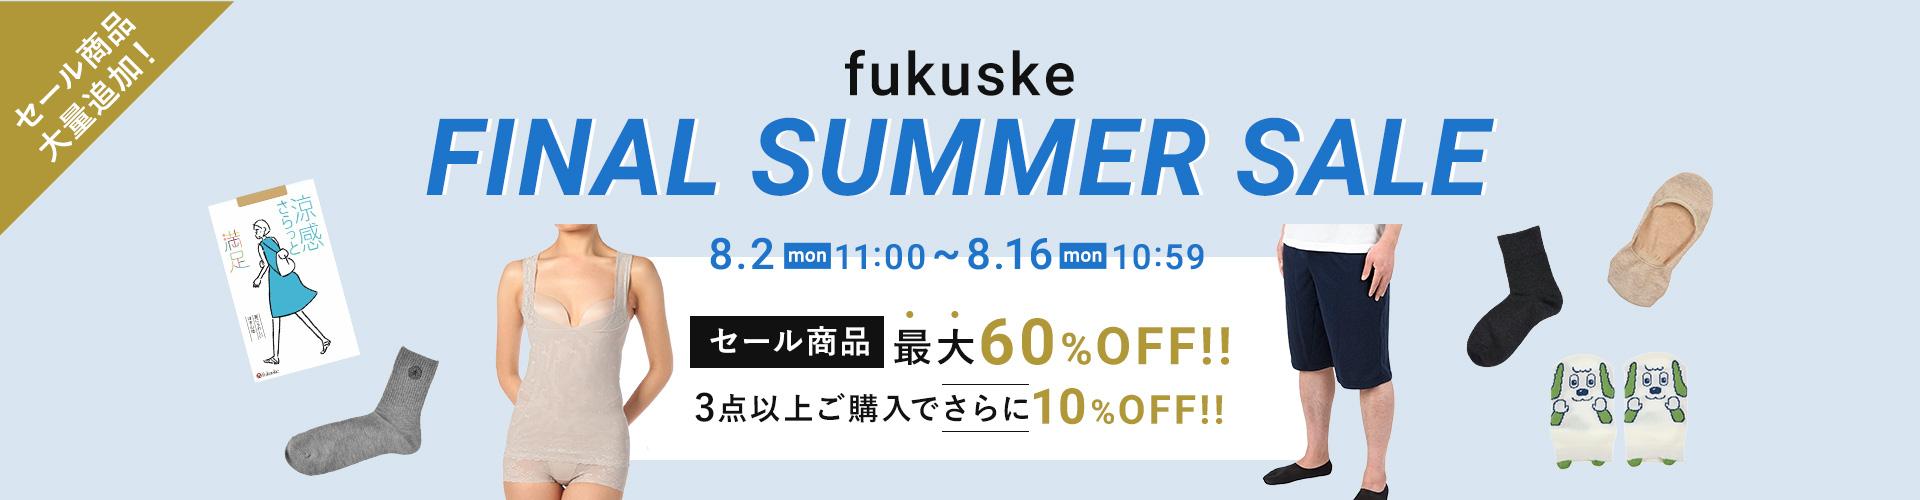 fukuske SUMMER SALE